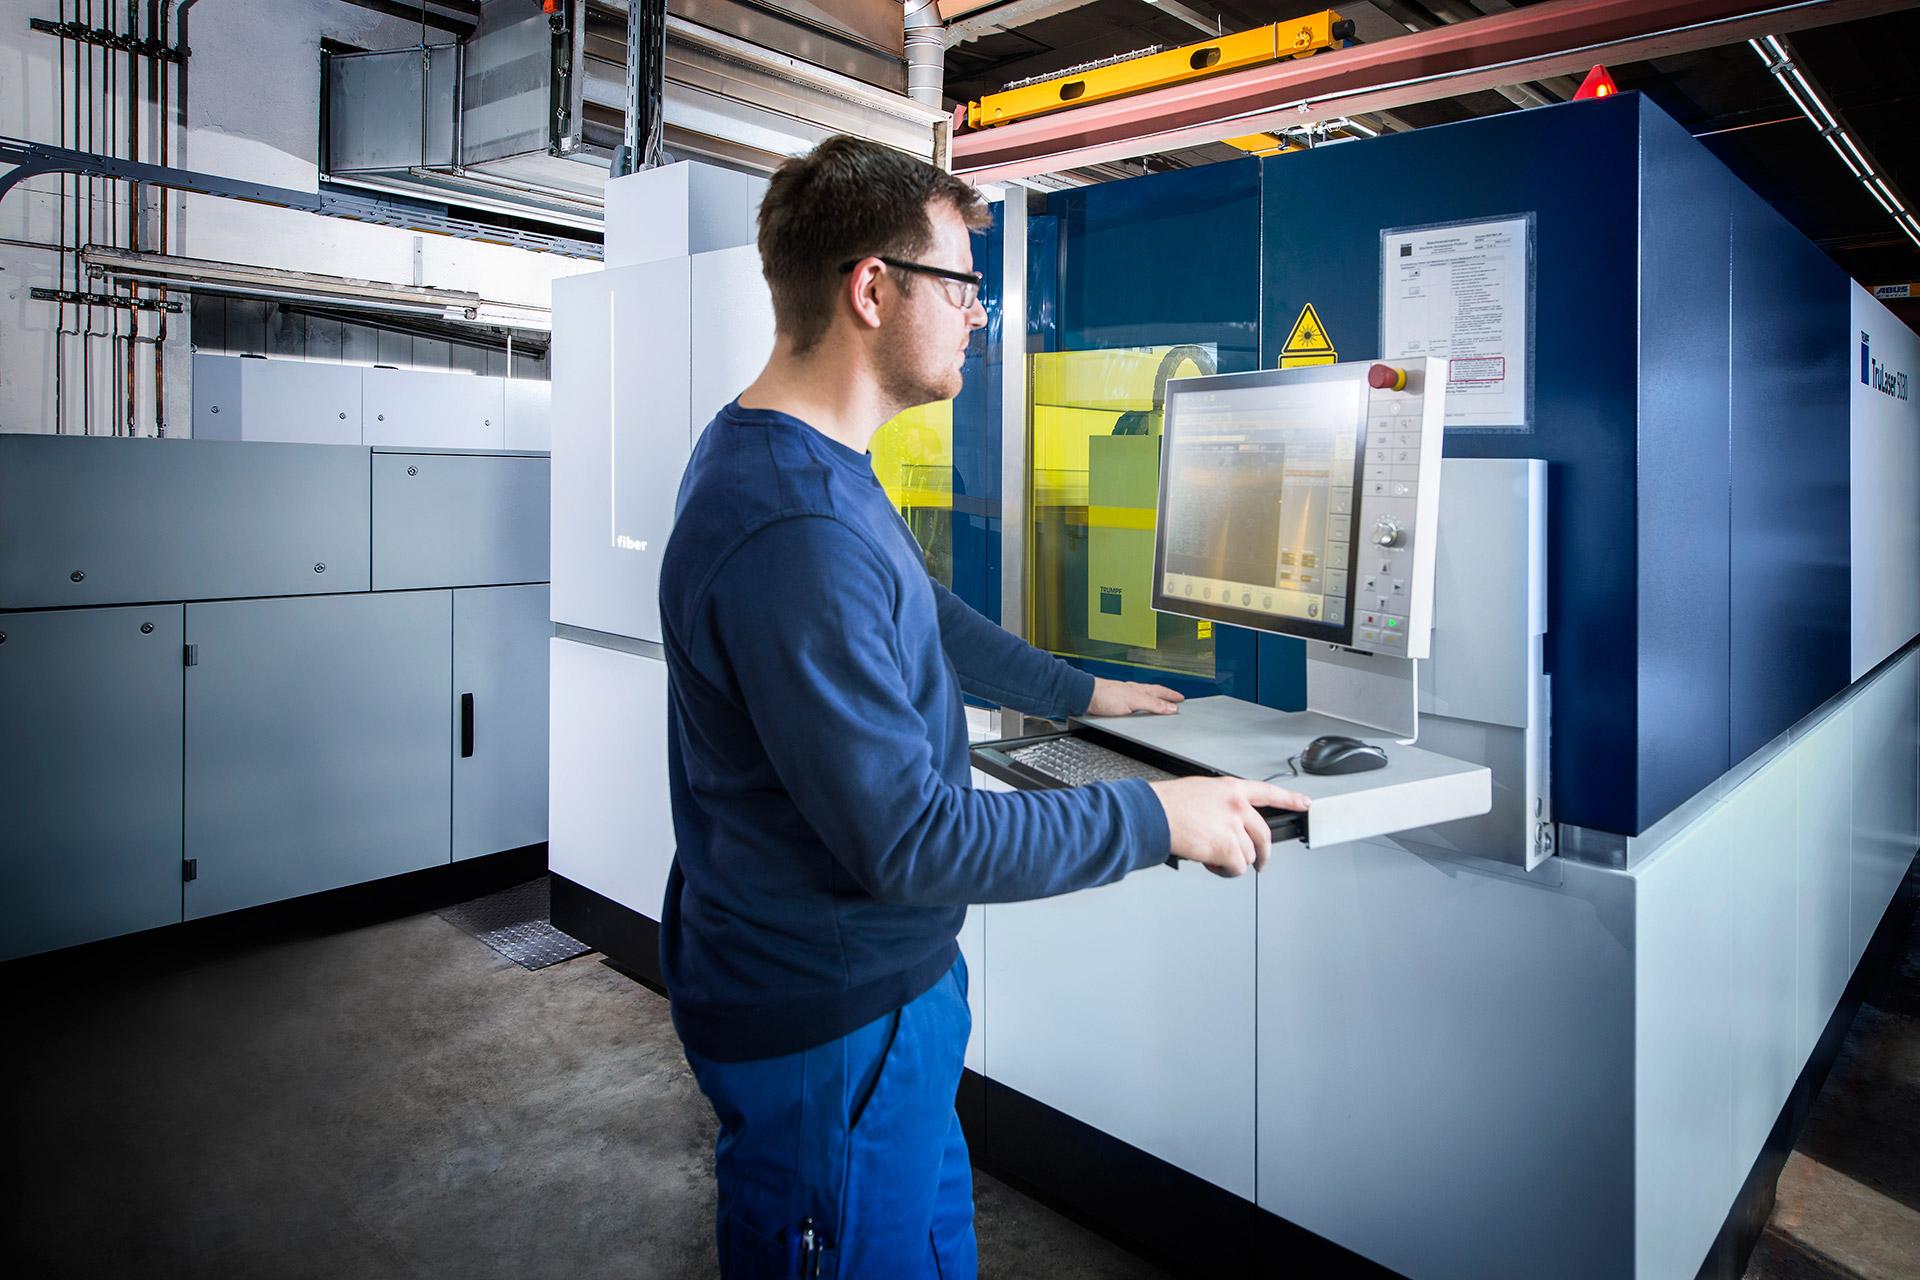 Glüpker Blechtechnologie: Lasern / laser cutting